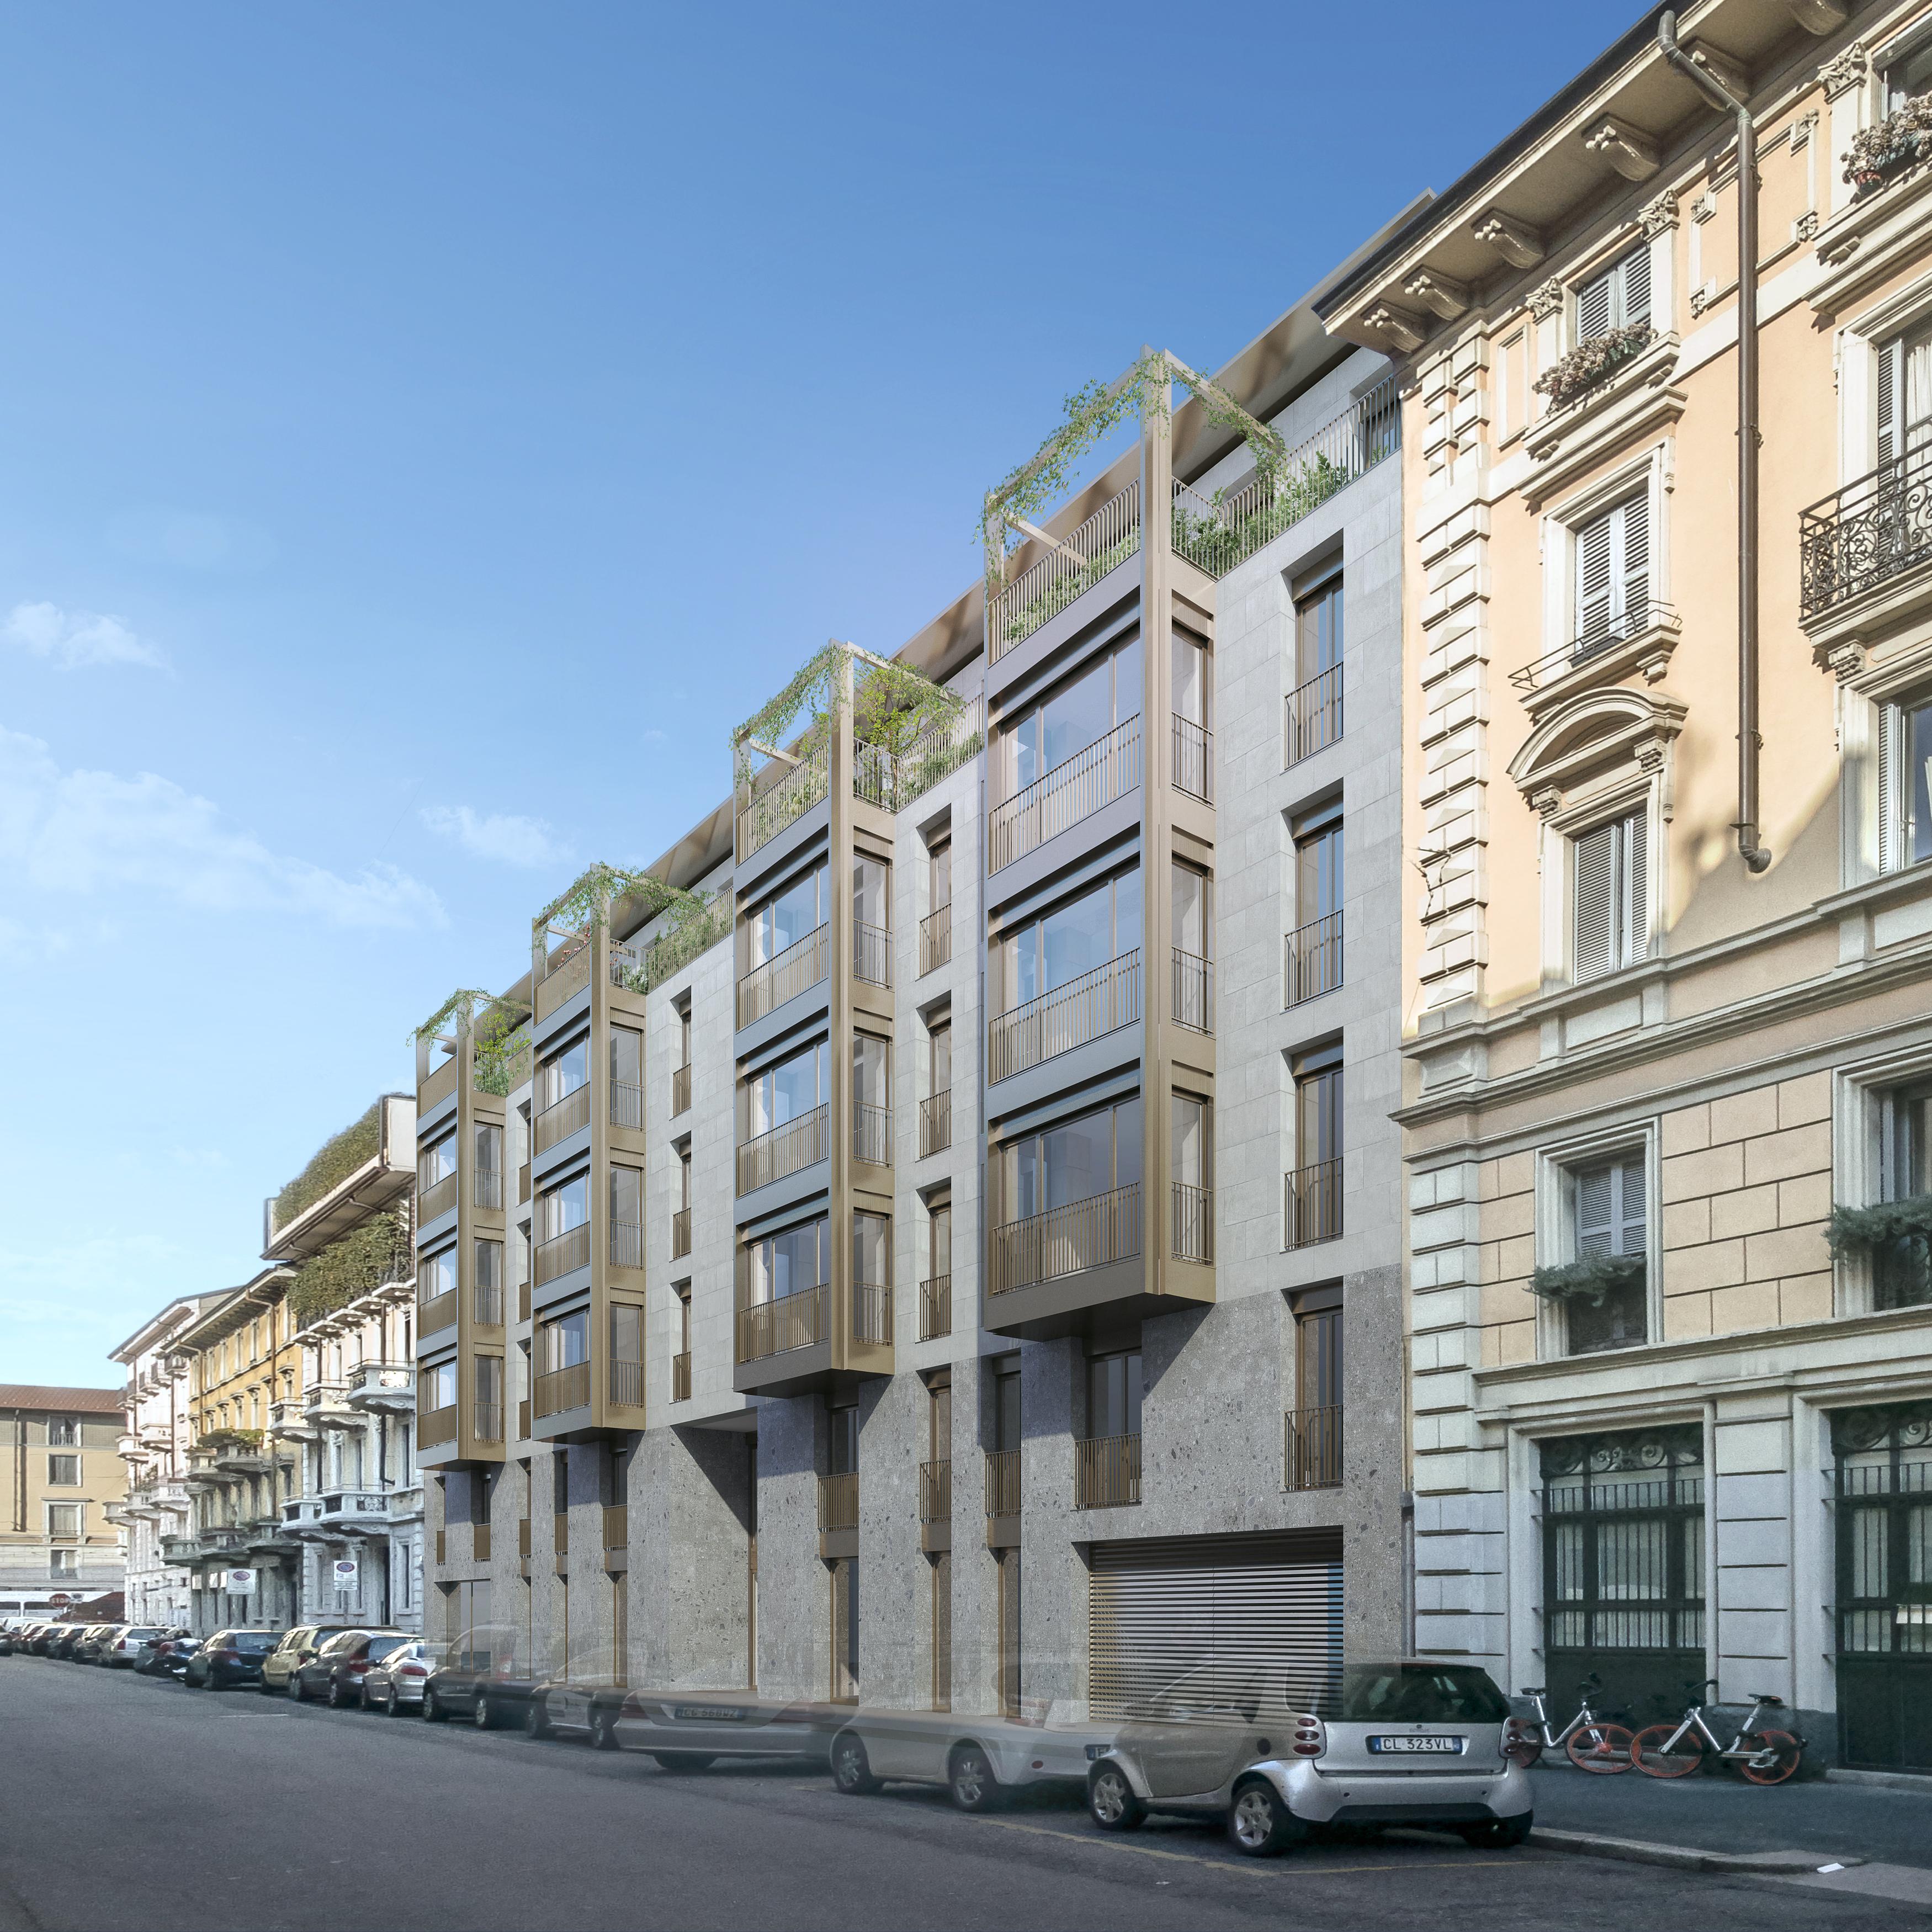 Palazzina di Via Kramer a Milano 1